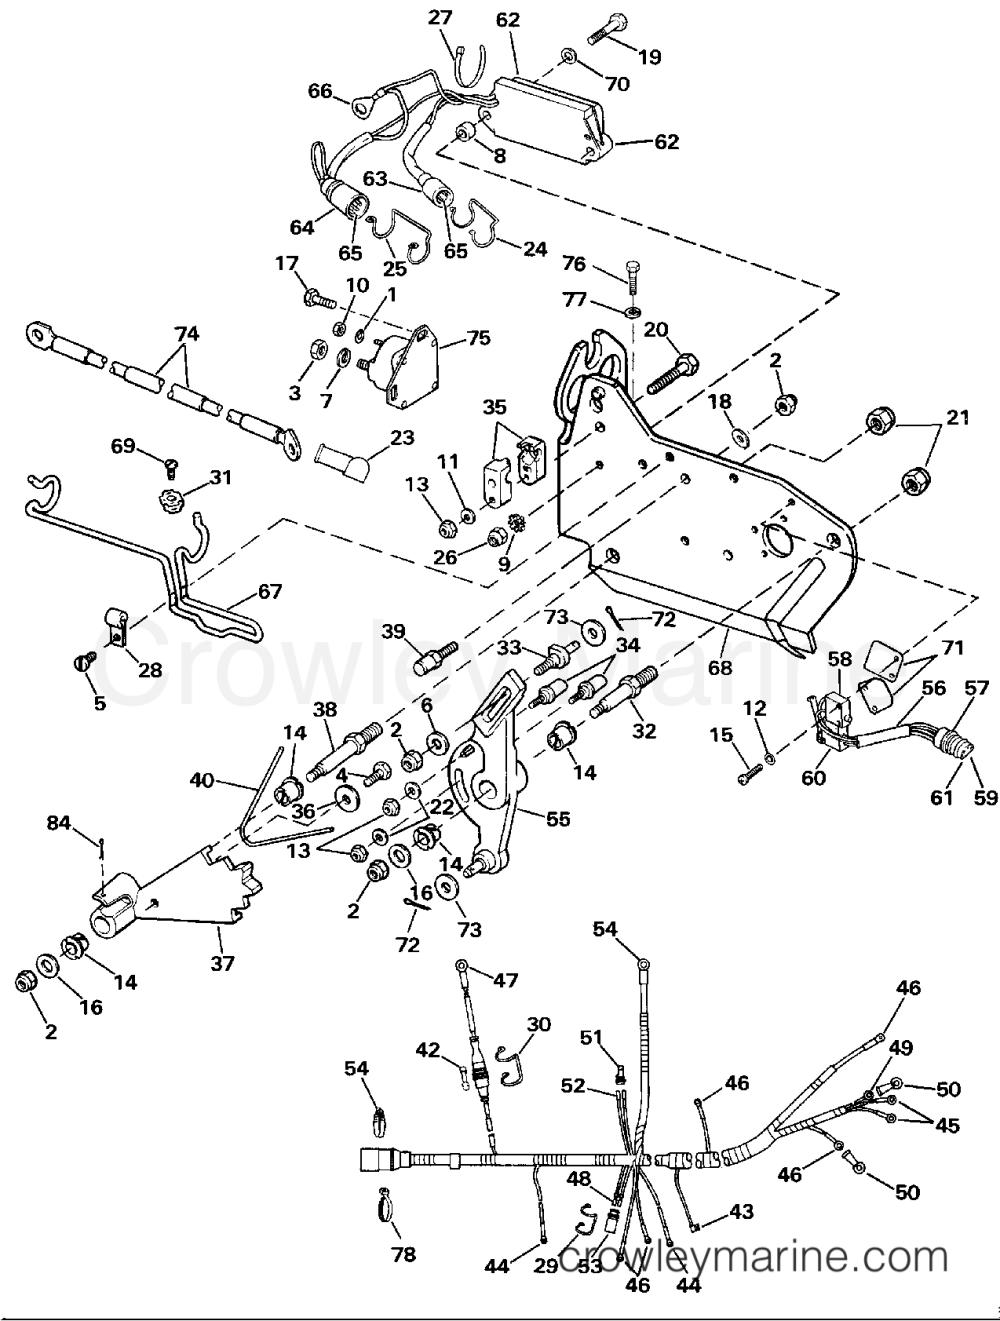 medium resolution of wire harness bracket solenoid 1989 omc stern drive 5 502amlmed omc stern drive wiring diagram